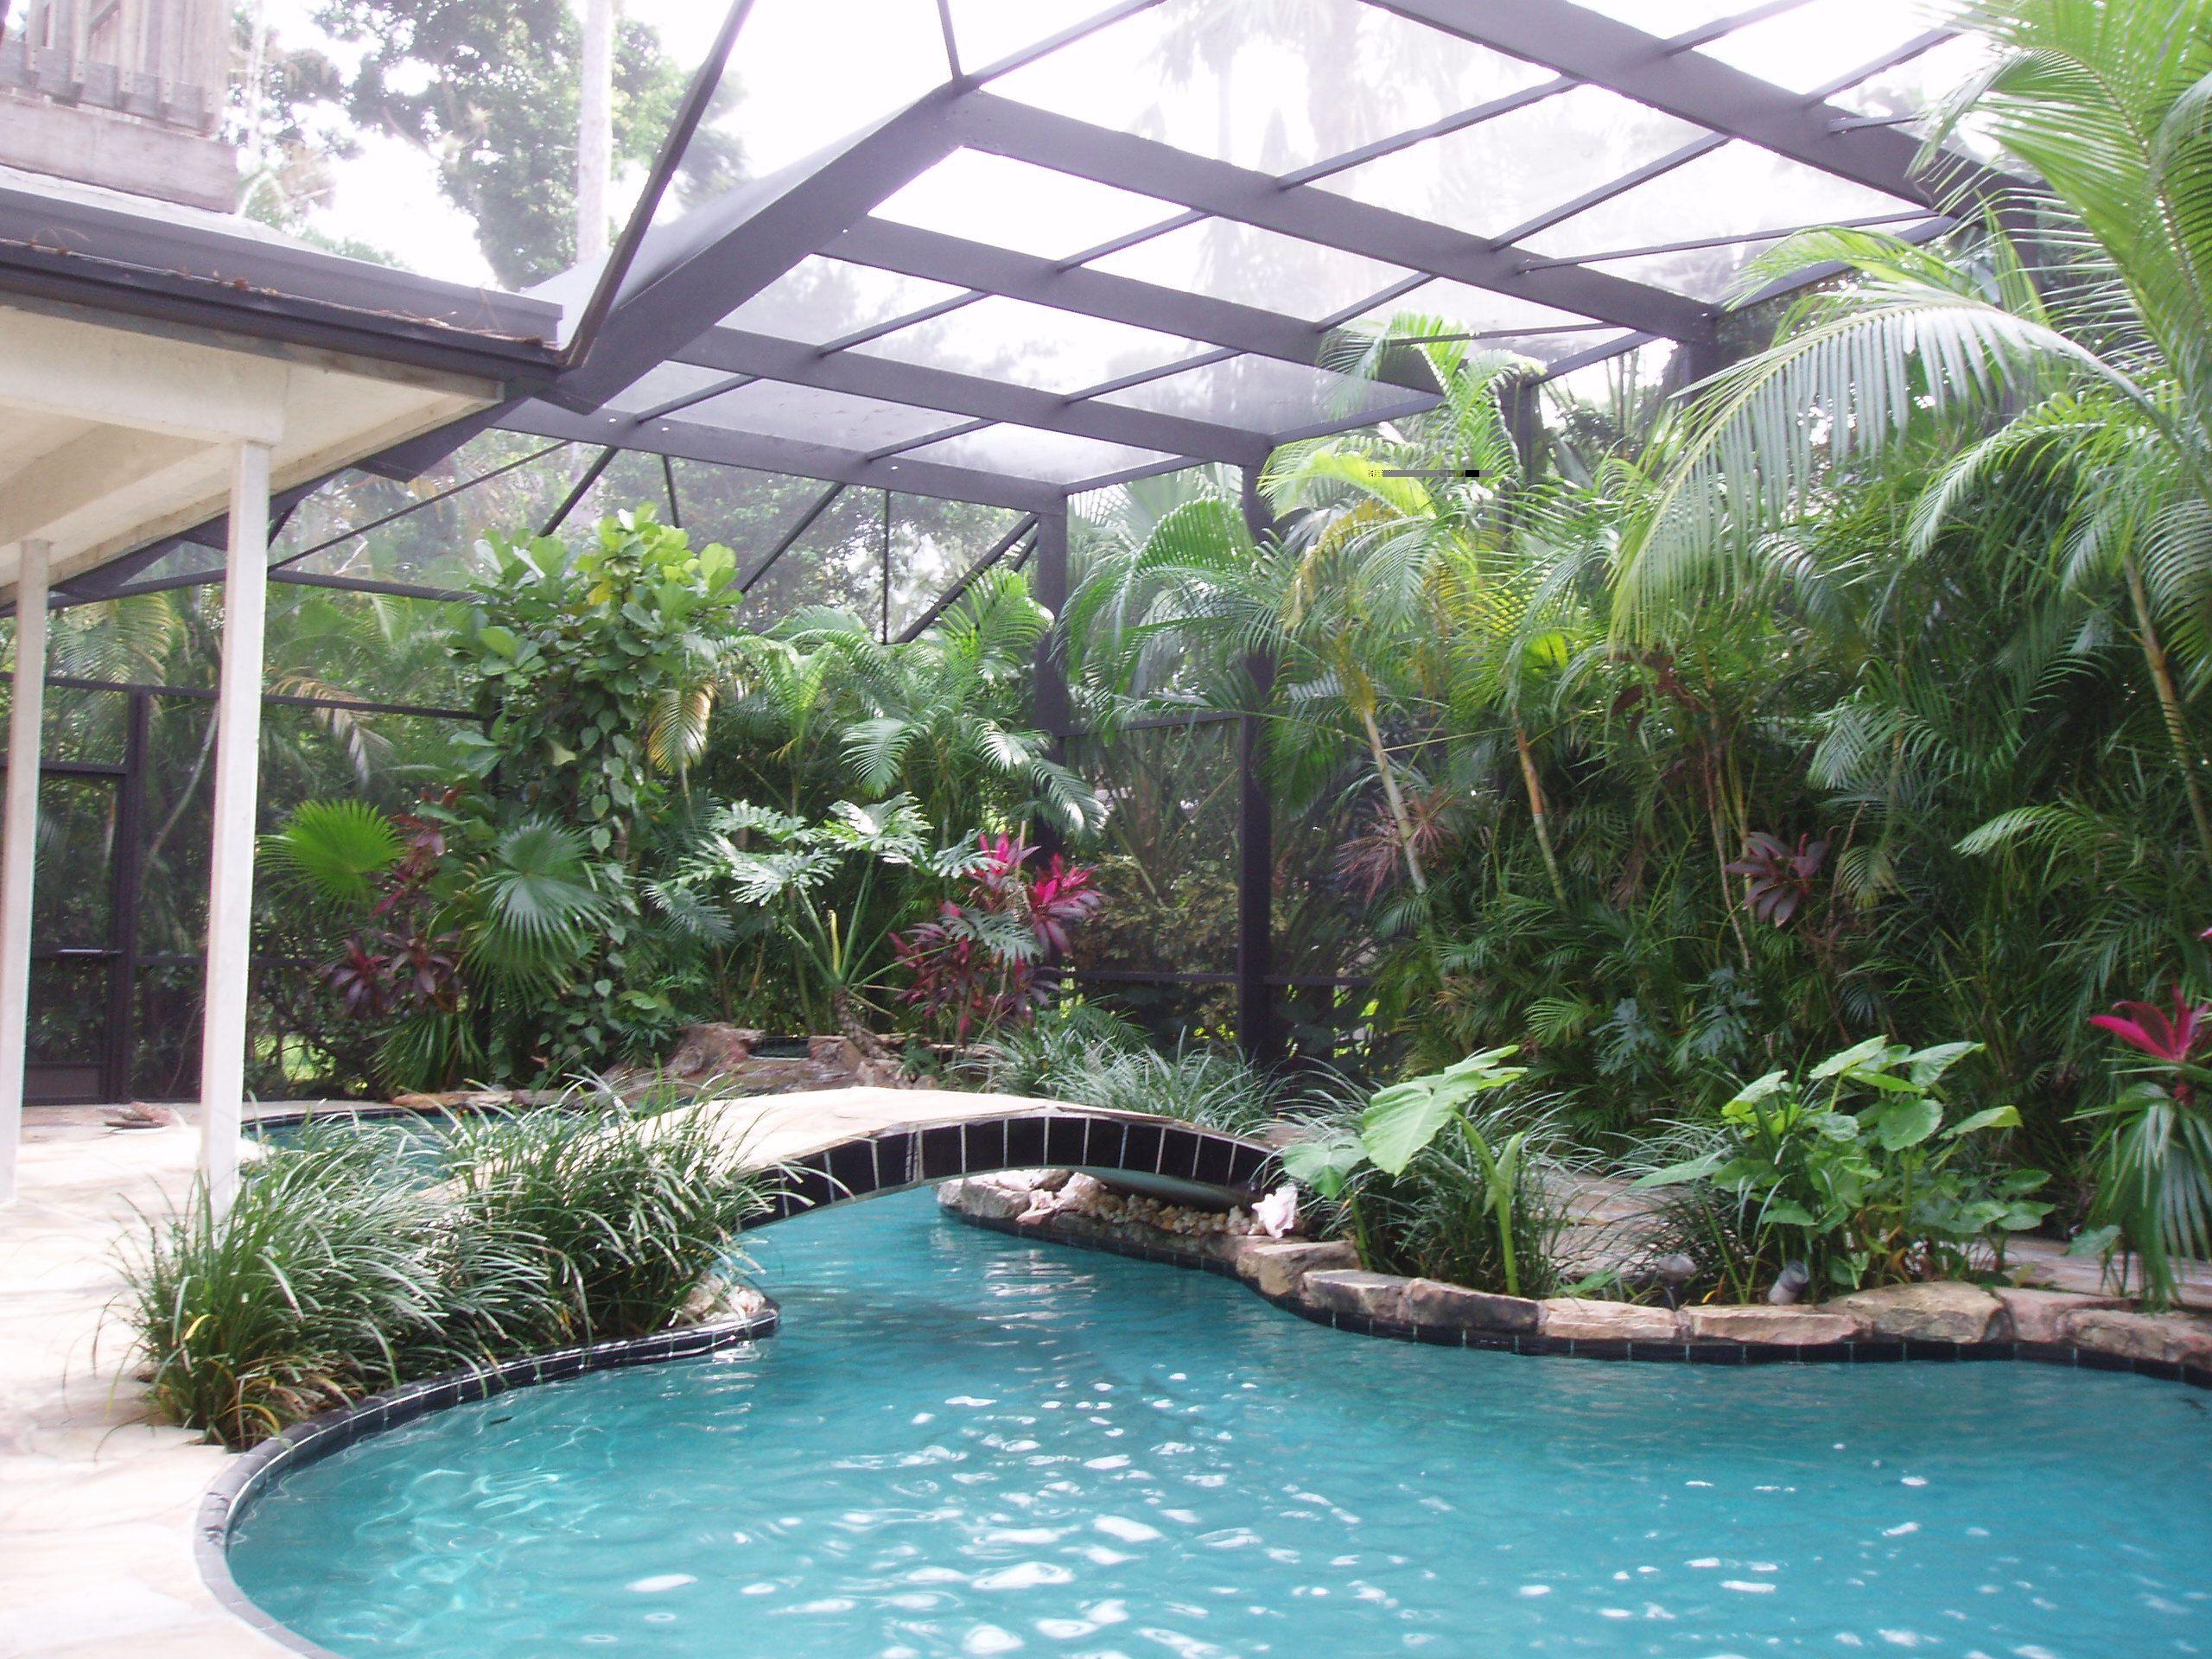 southern florida landscape ideas - Google Search | Florida Landscape ...